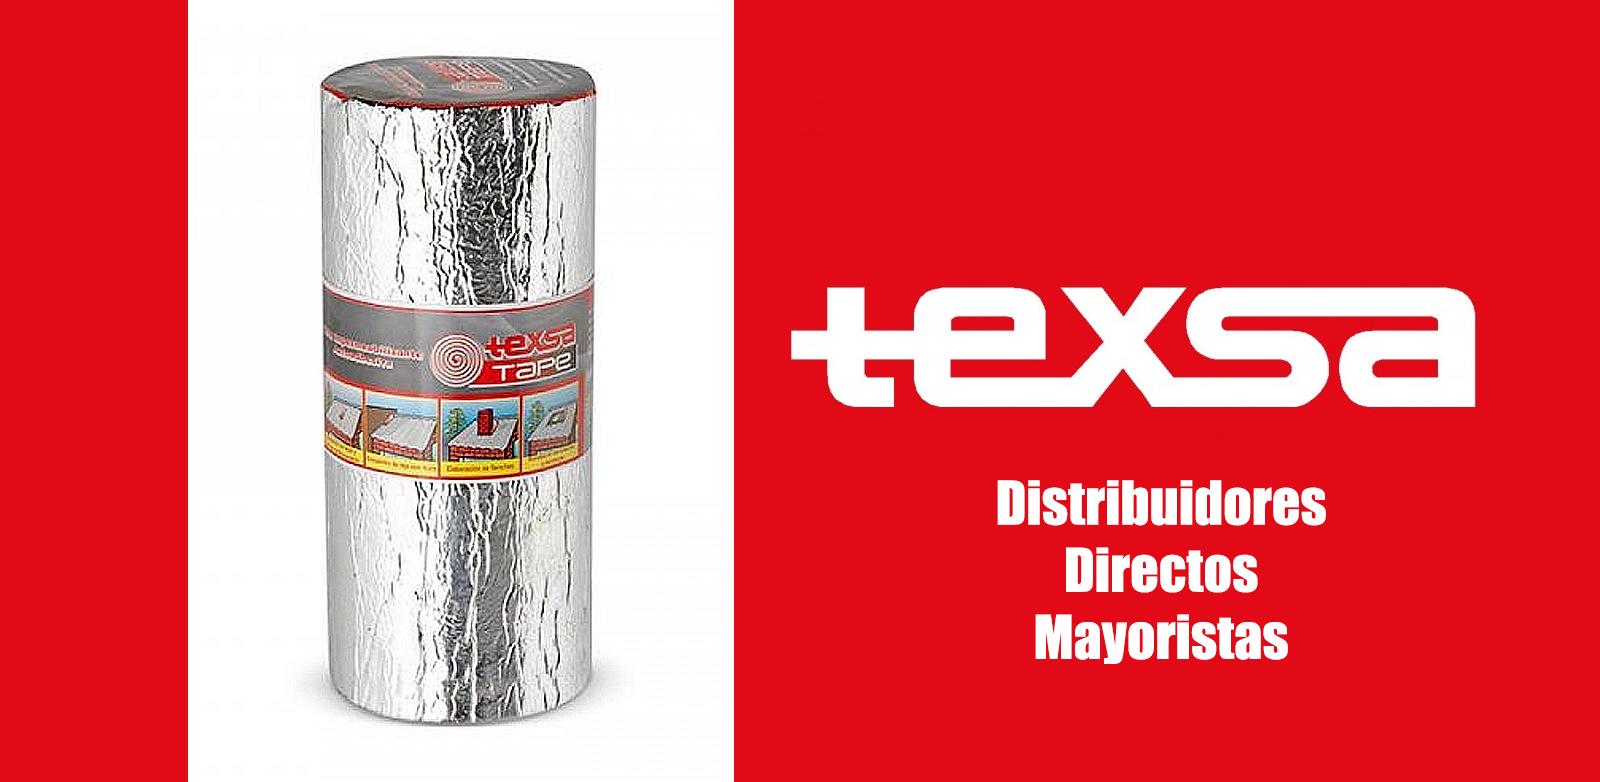 Texsa - Distribuidores Directos Mayoristas - Bogota